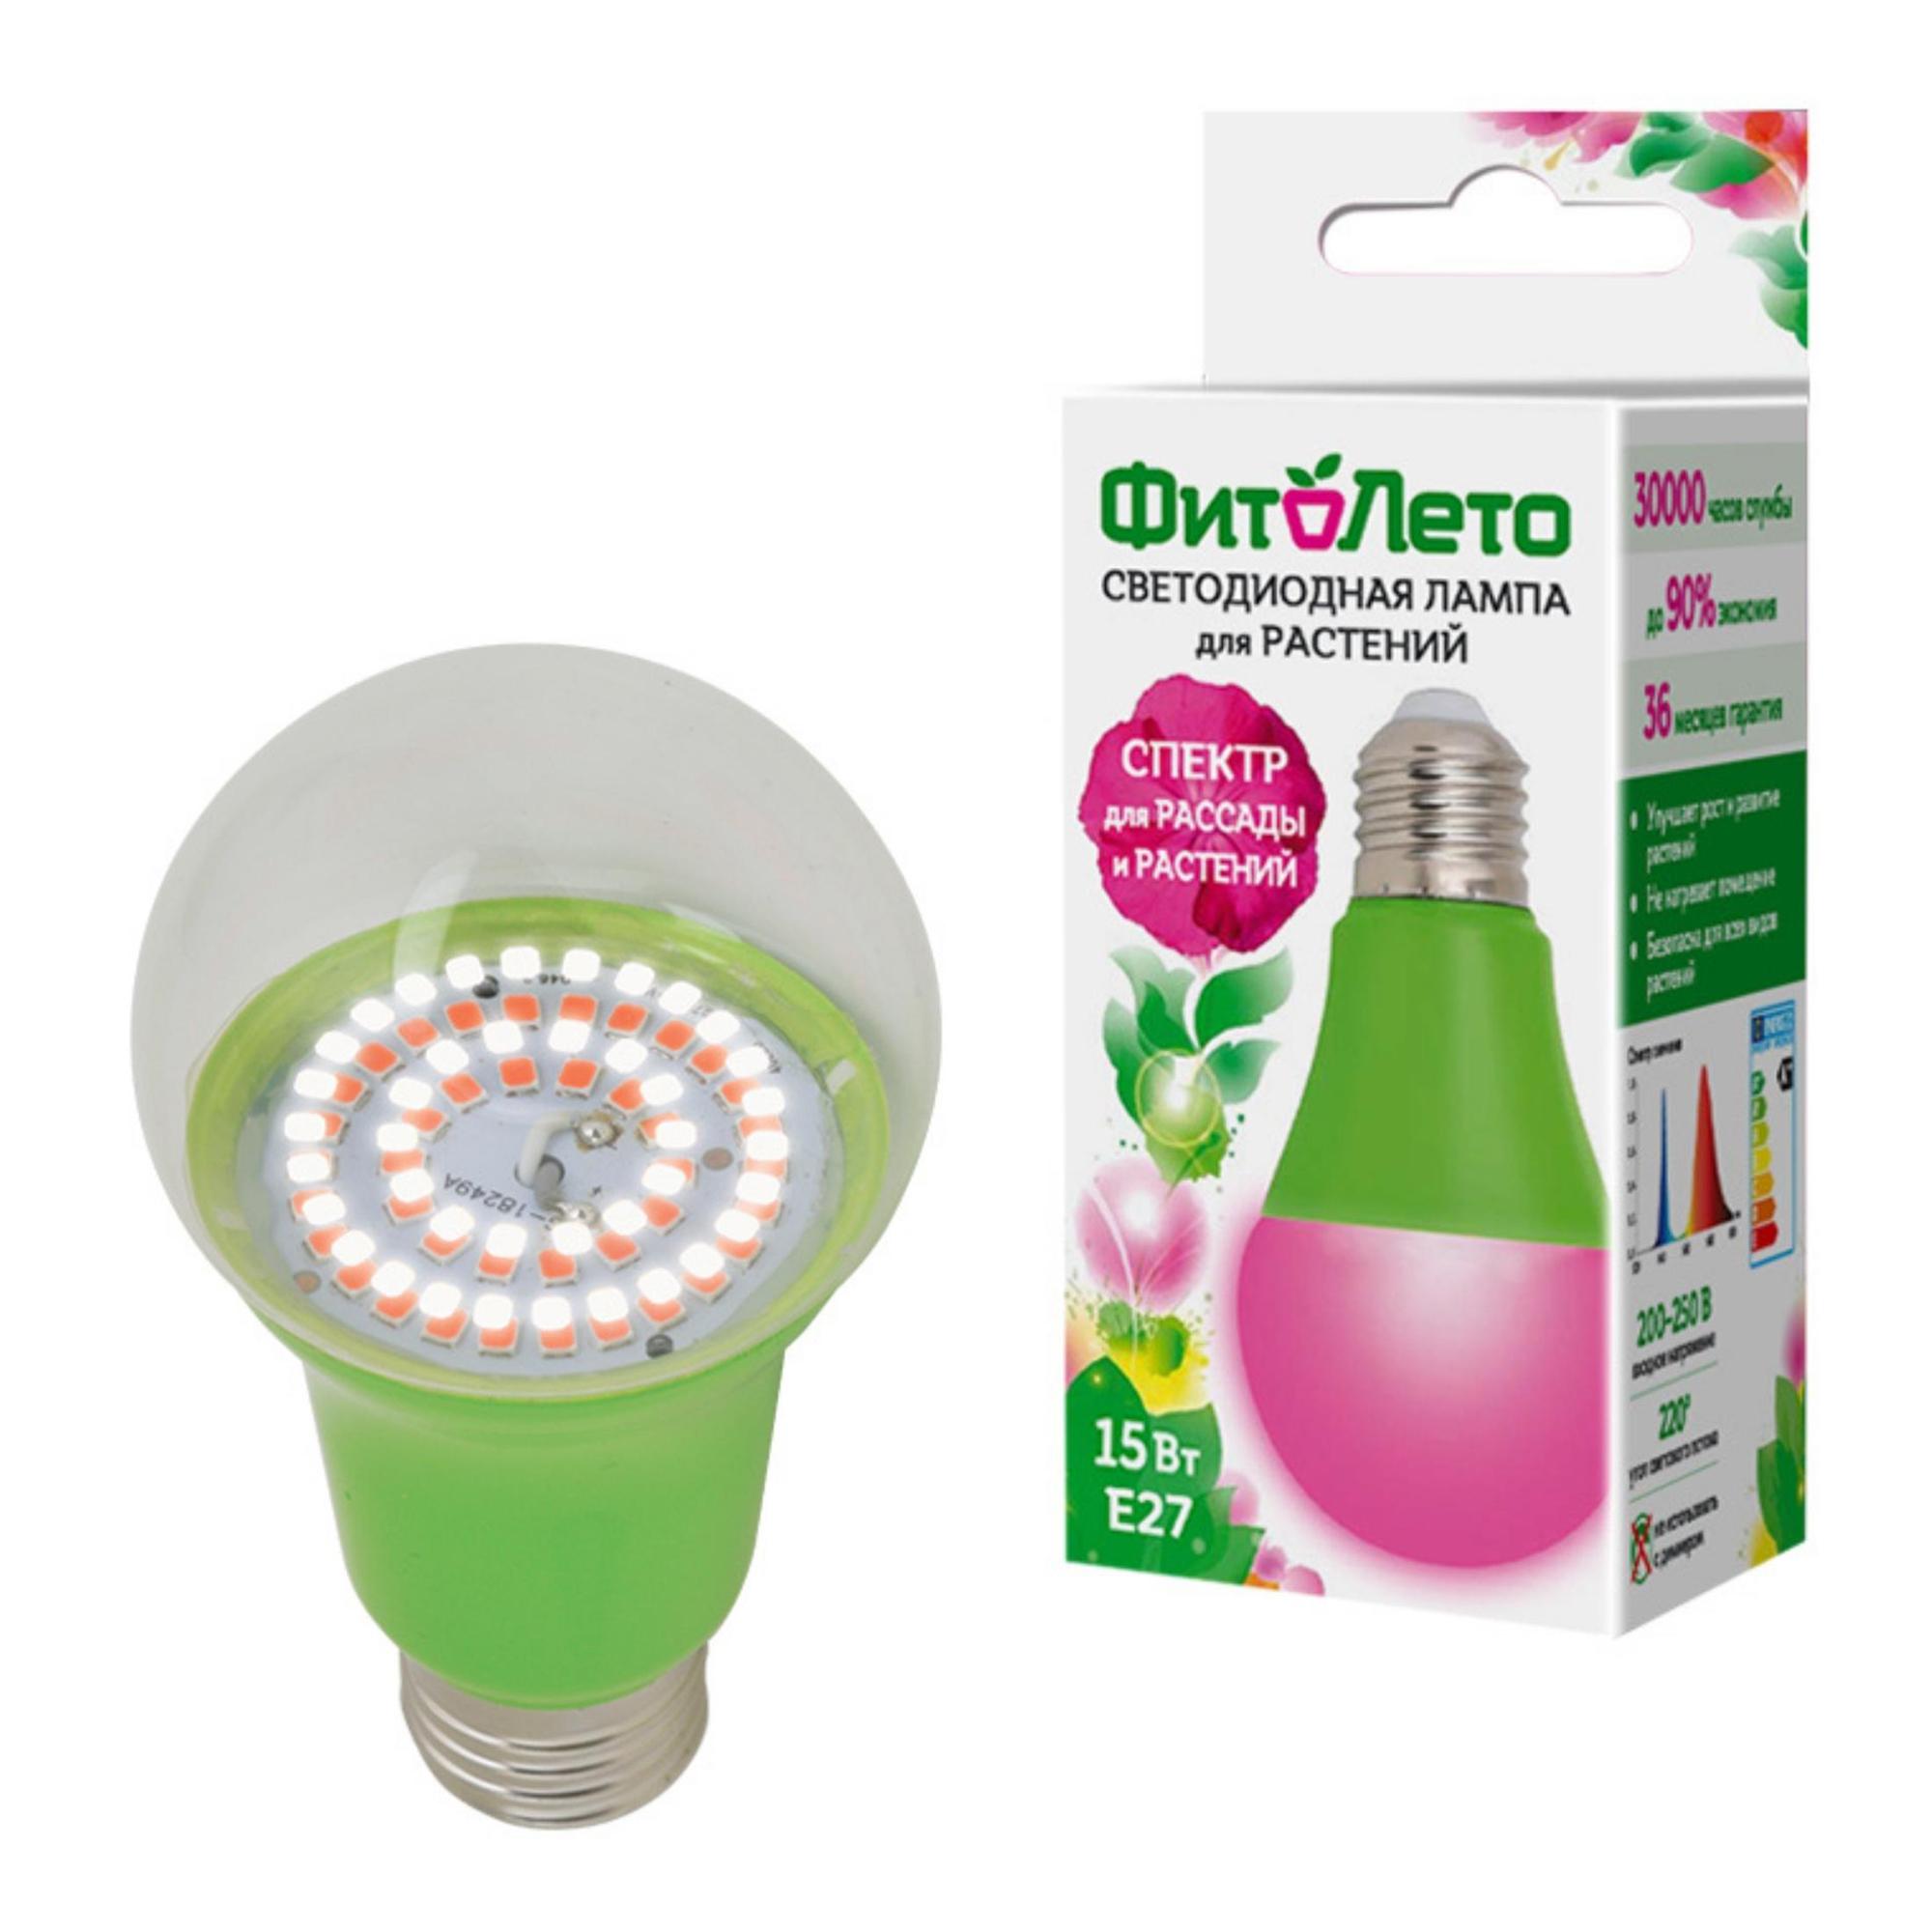 LED-A60-15W/SPSB/E27/CL PLP30GR